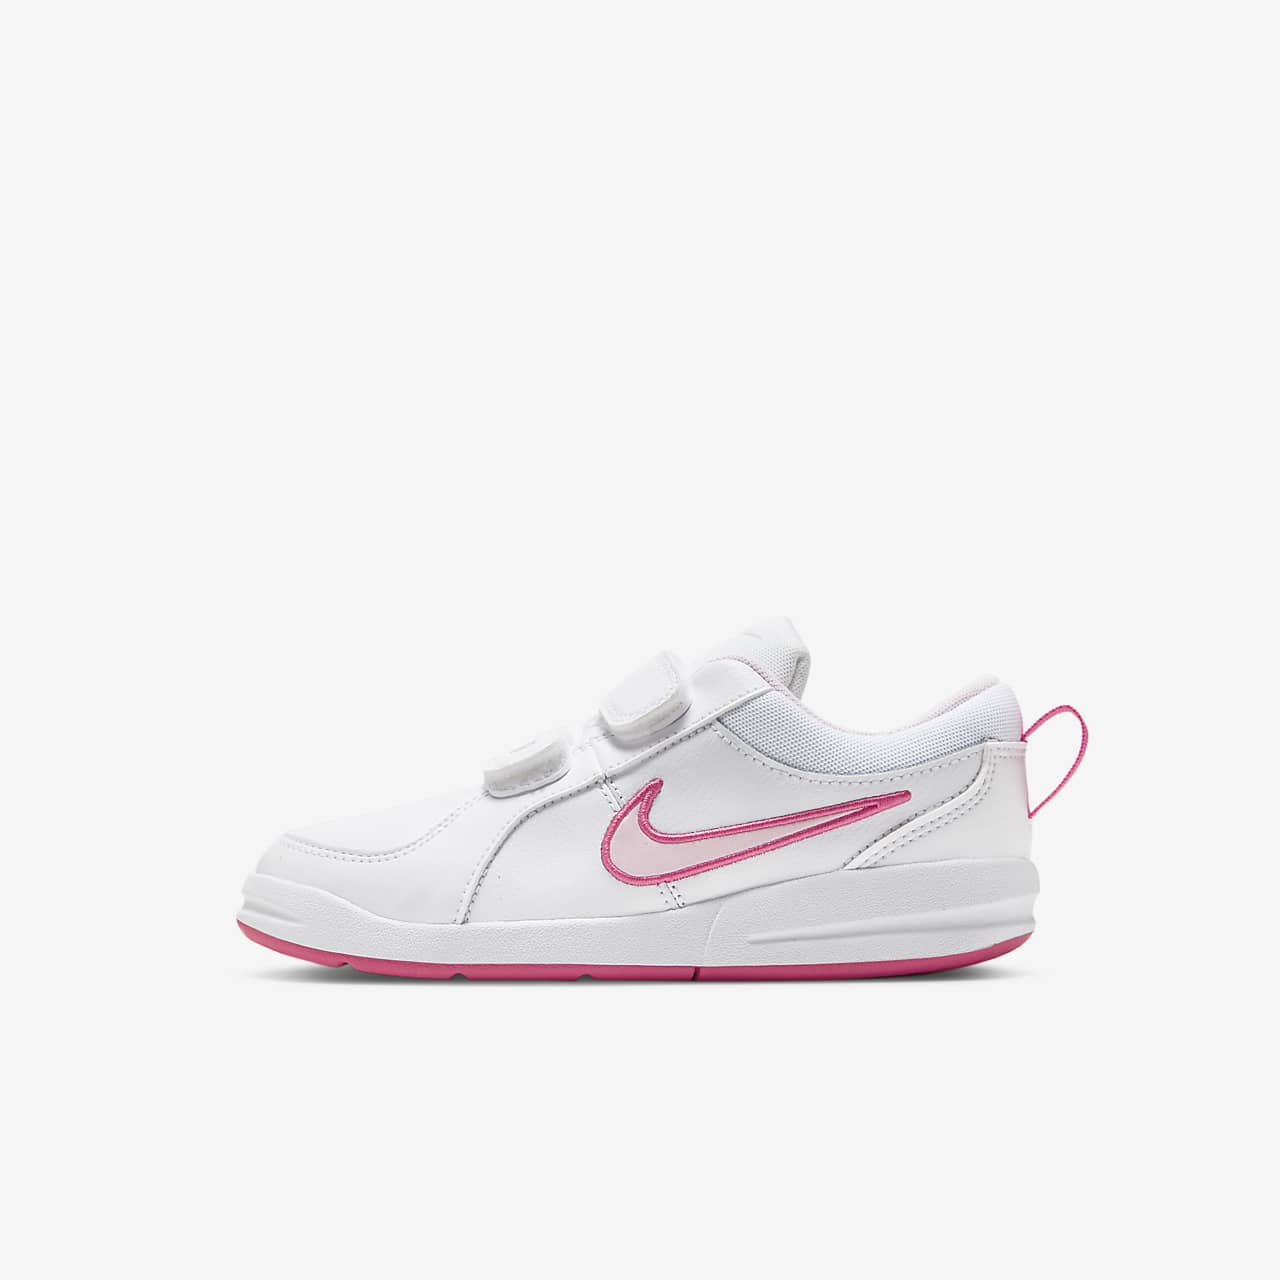 chaussure enfant fille nike 34